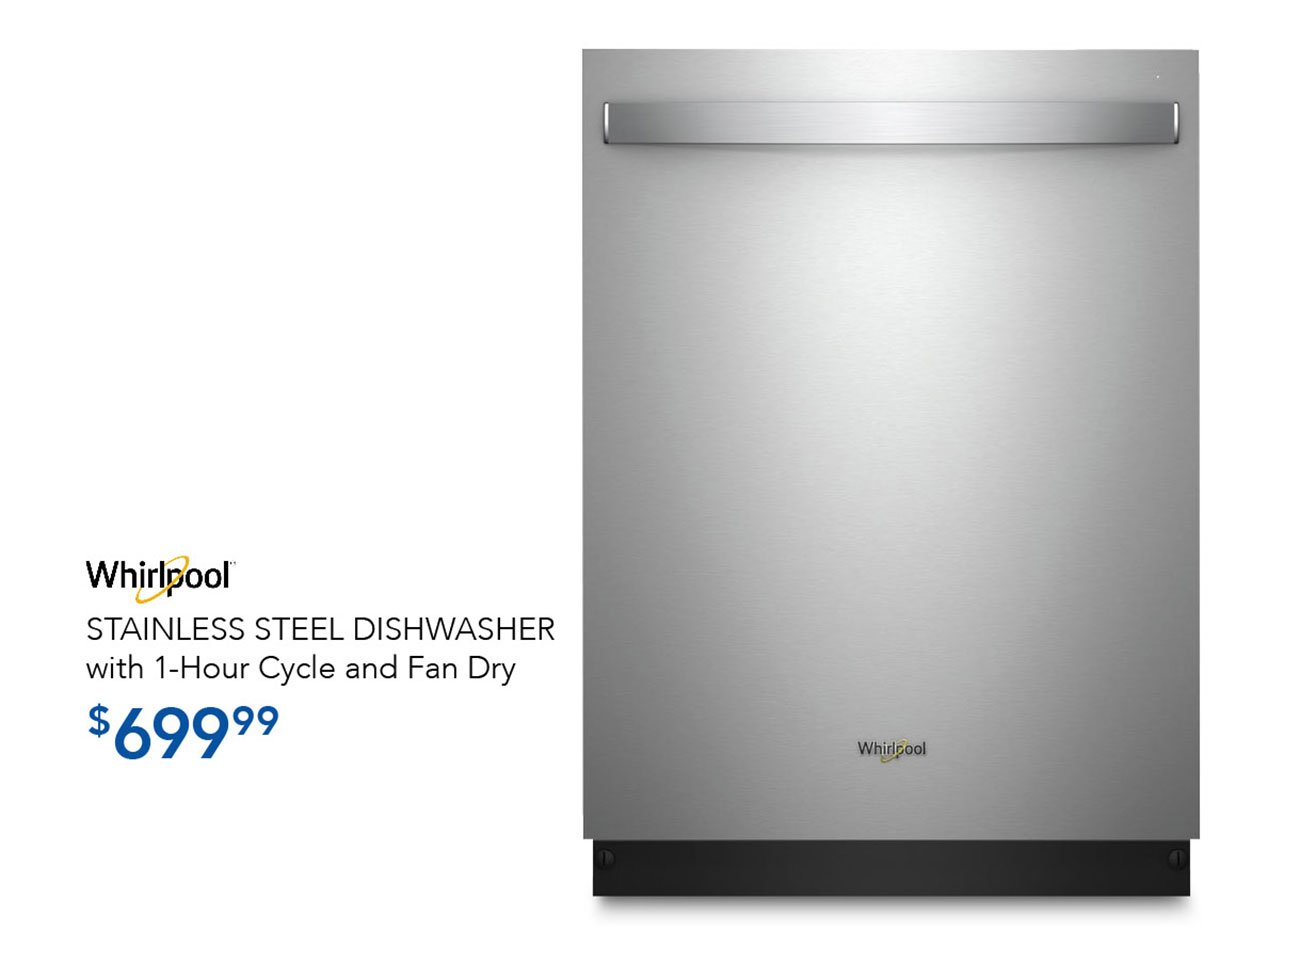 Whirlpool-stainless-steel-dishwasher